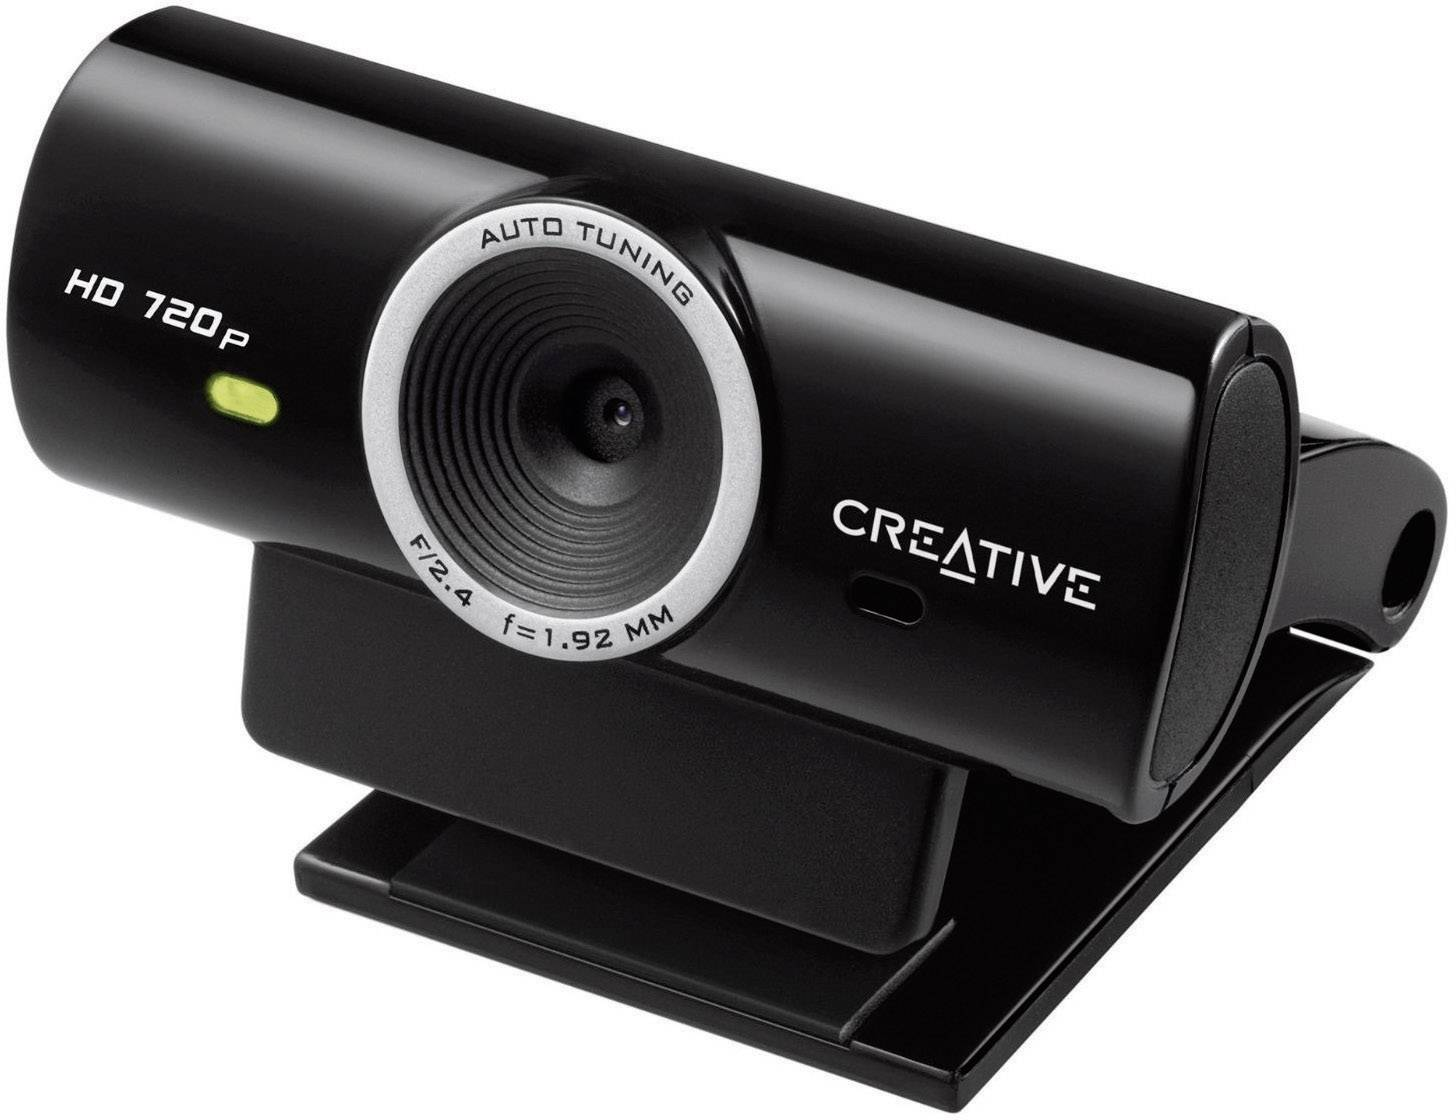 HD webkamera Creative LIVE CAM SYNC HD 720P